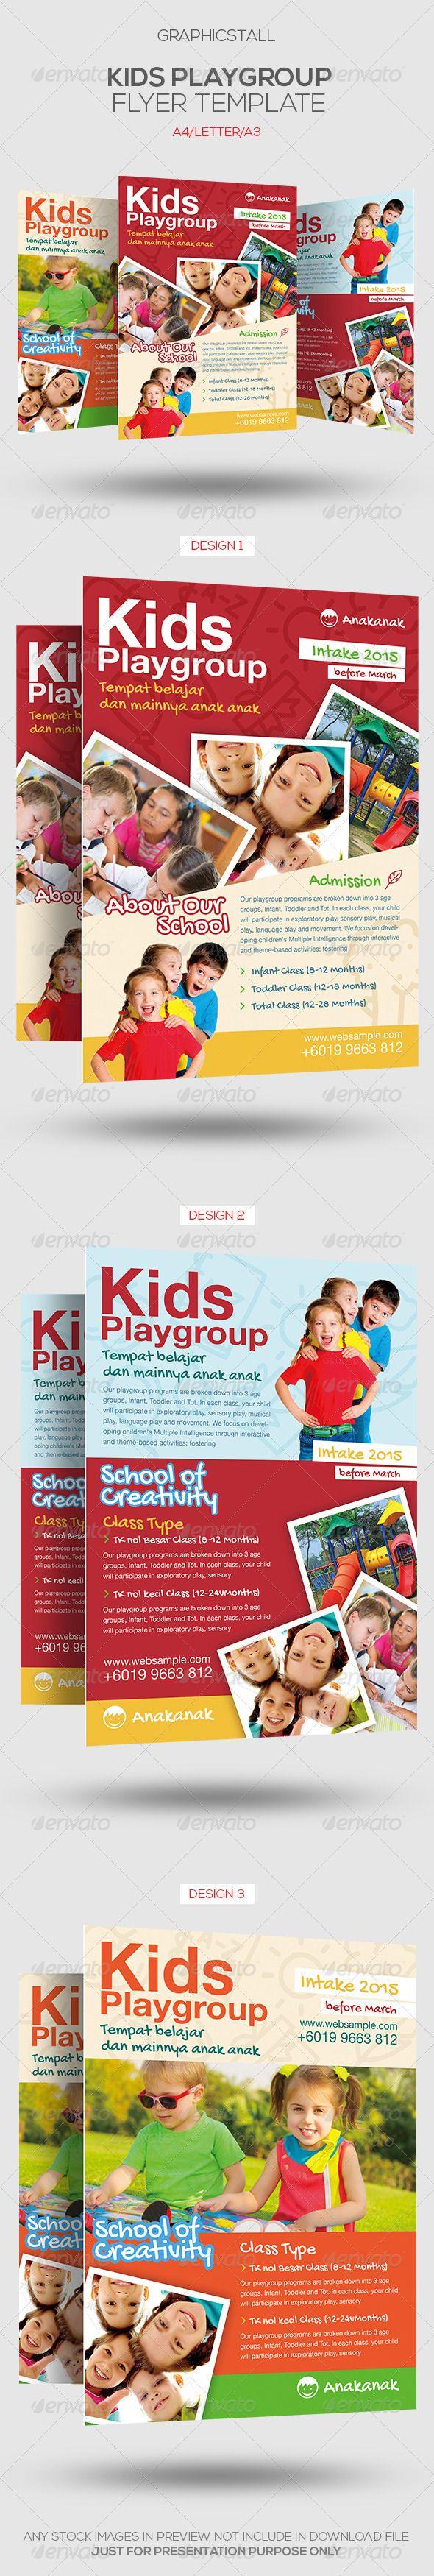 12 best brochure images on pinterest design ideas brochure